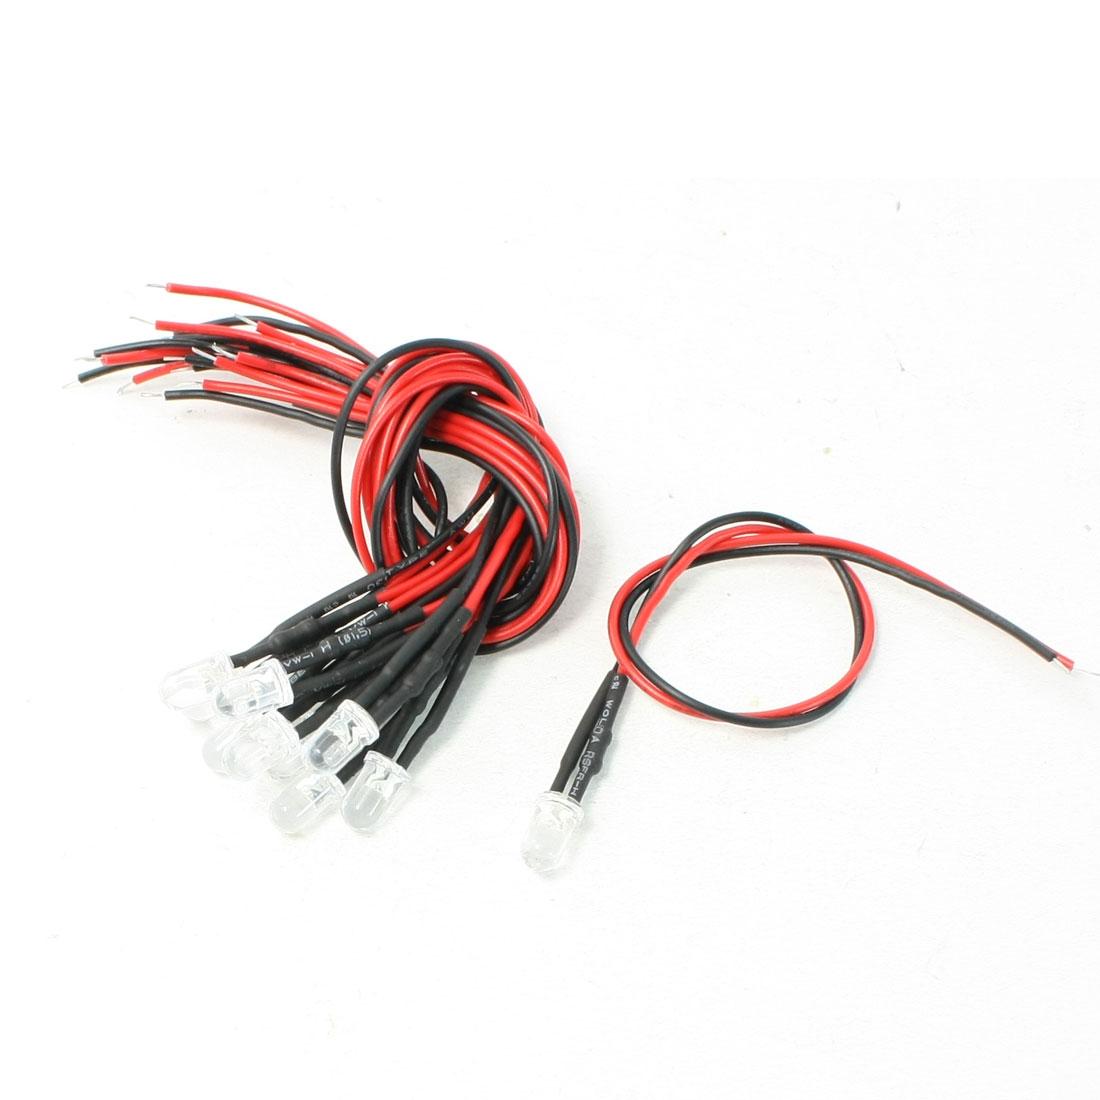 0.1W Power DC12V Volts Universal 2 Wire Car White Light LED Bulbs Lamp 10 Pcs